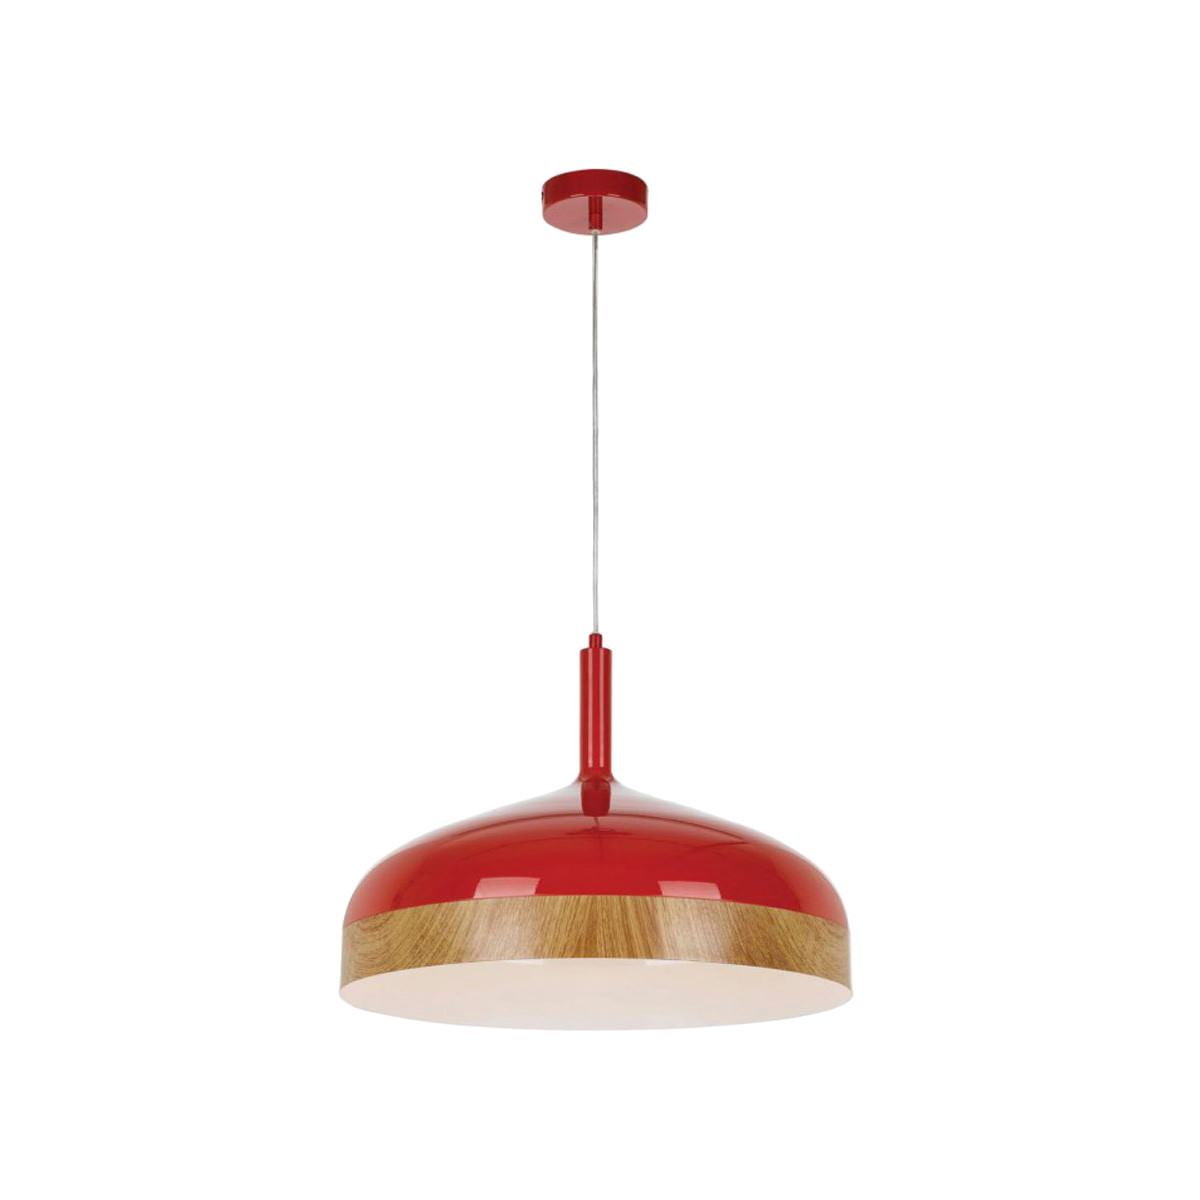 Bresno Metal Pendant Light, Large, Red